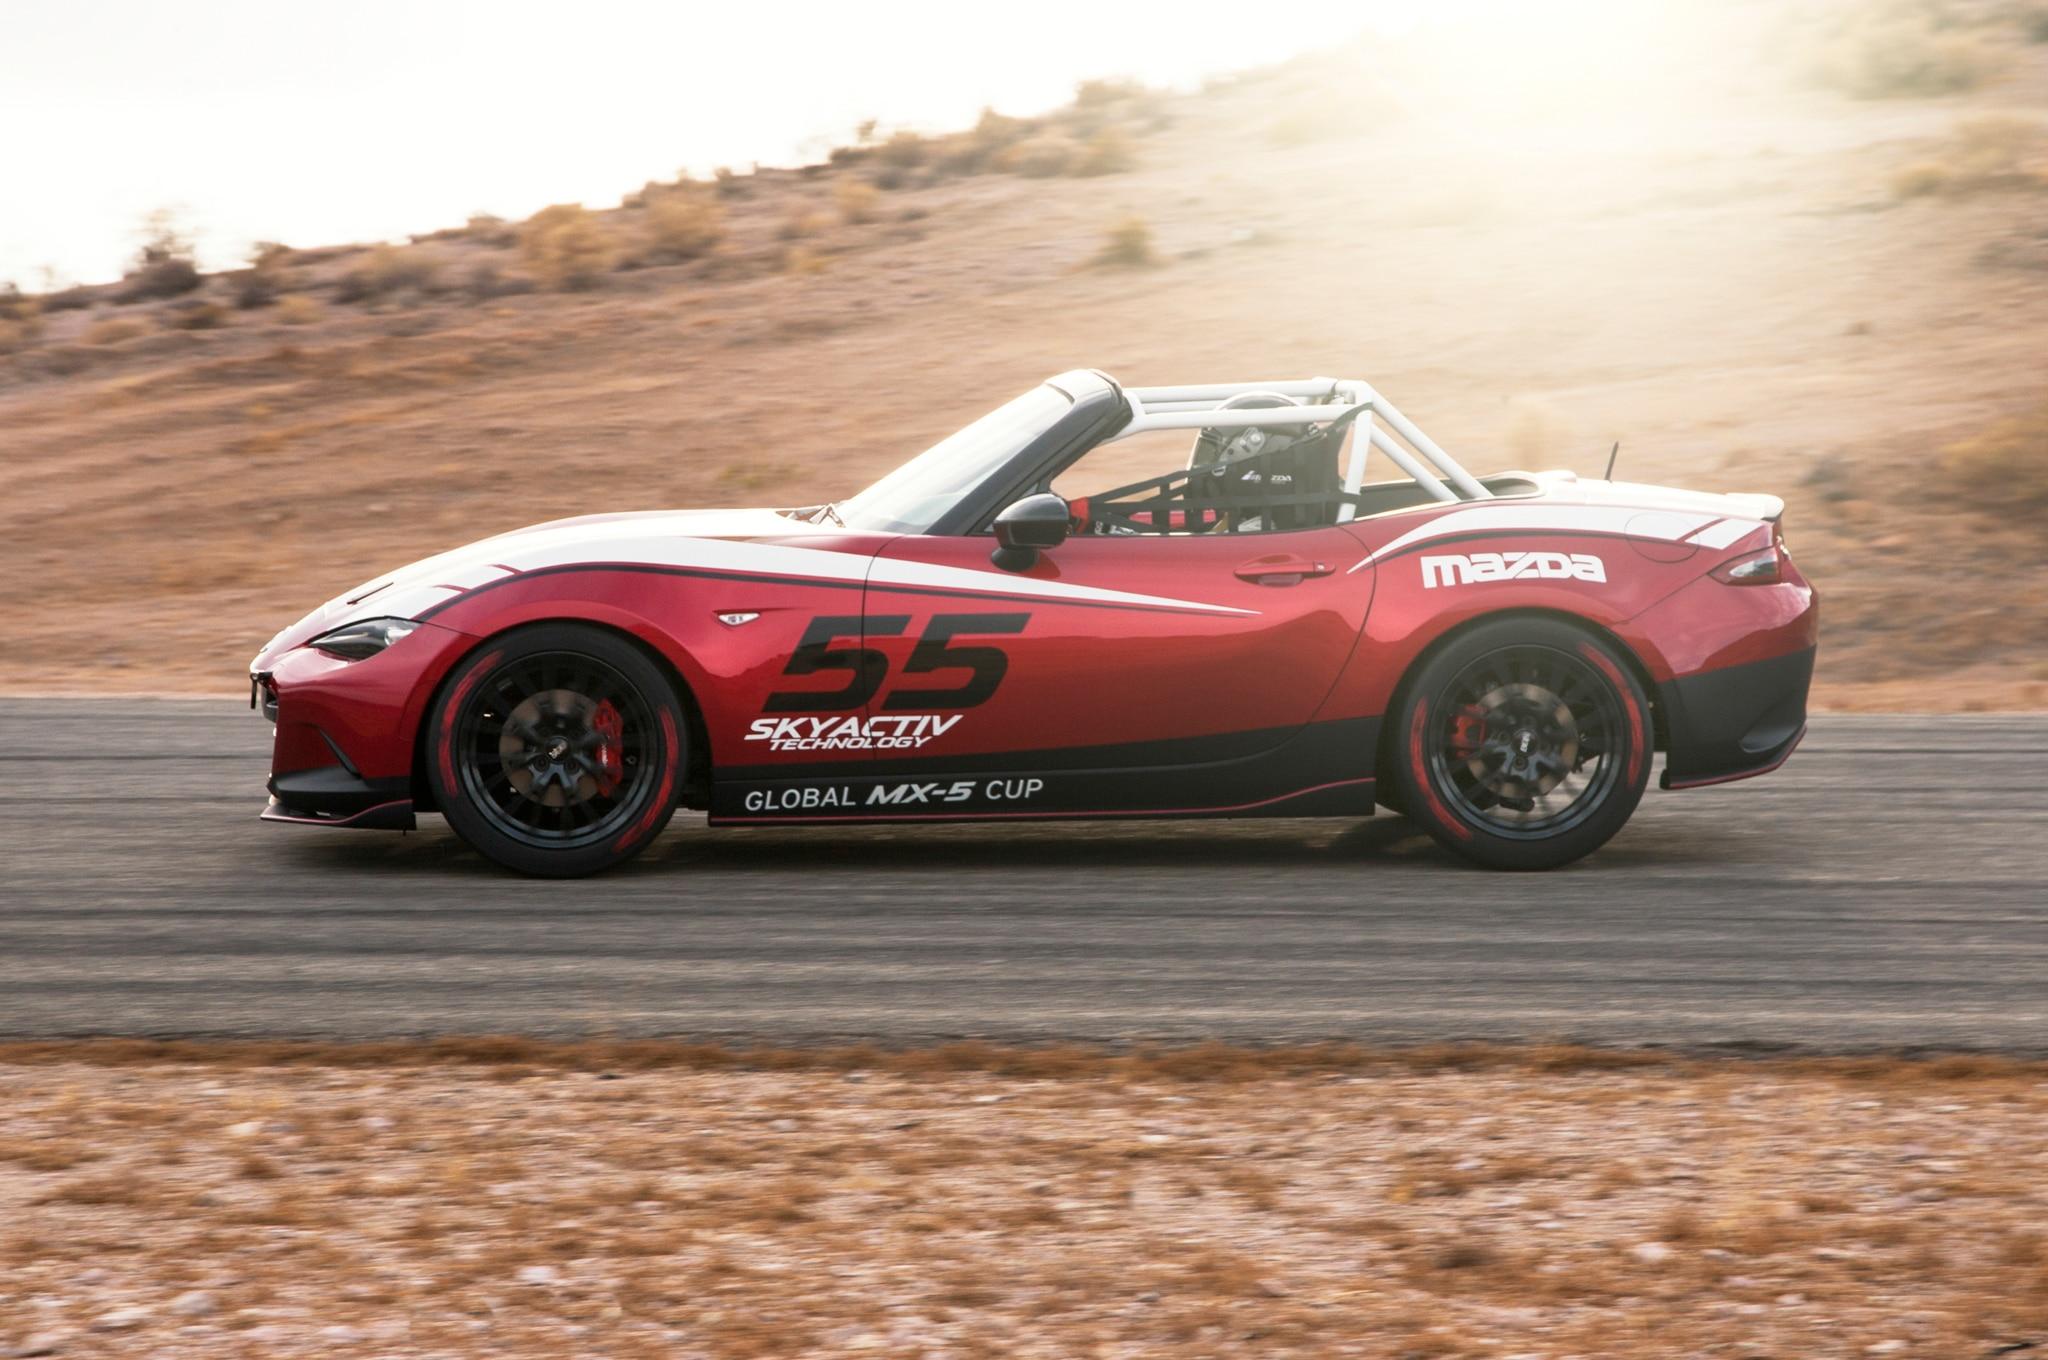 2016 Mazda MX-5 Cup Racing Car Costs $53,000